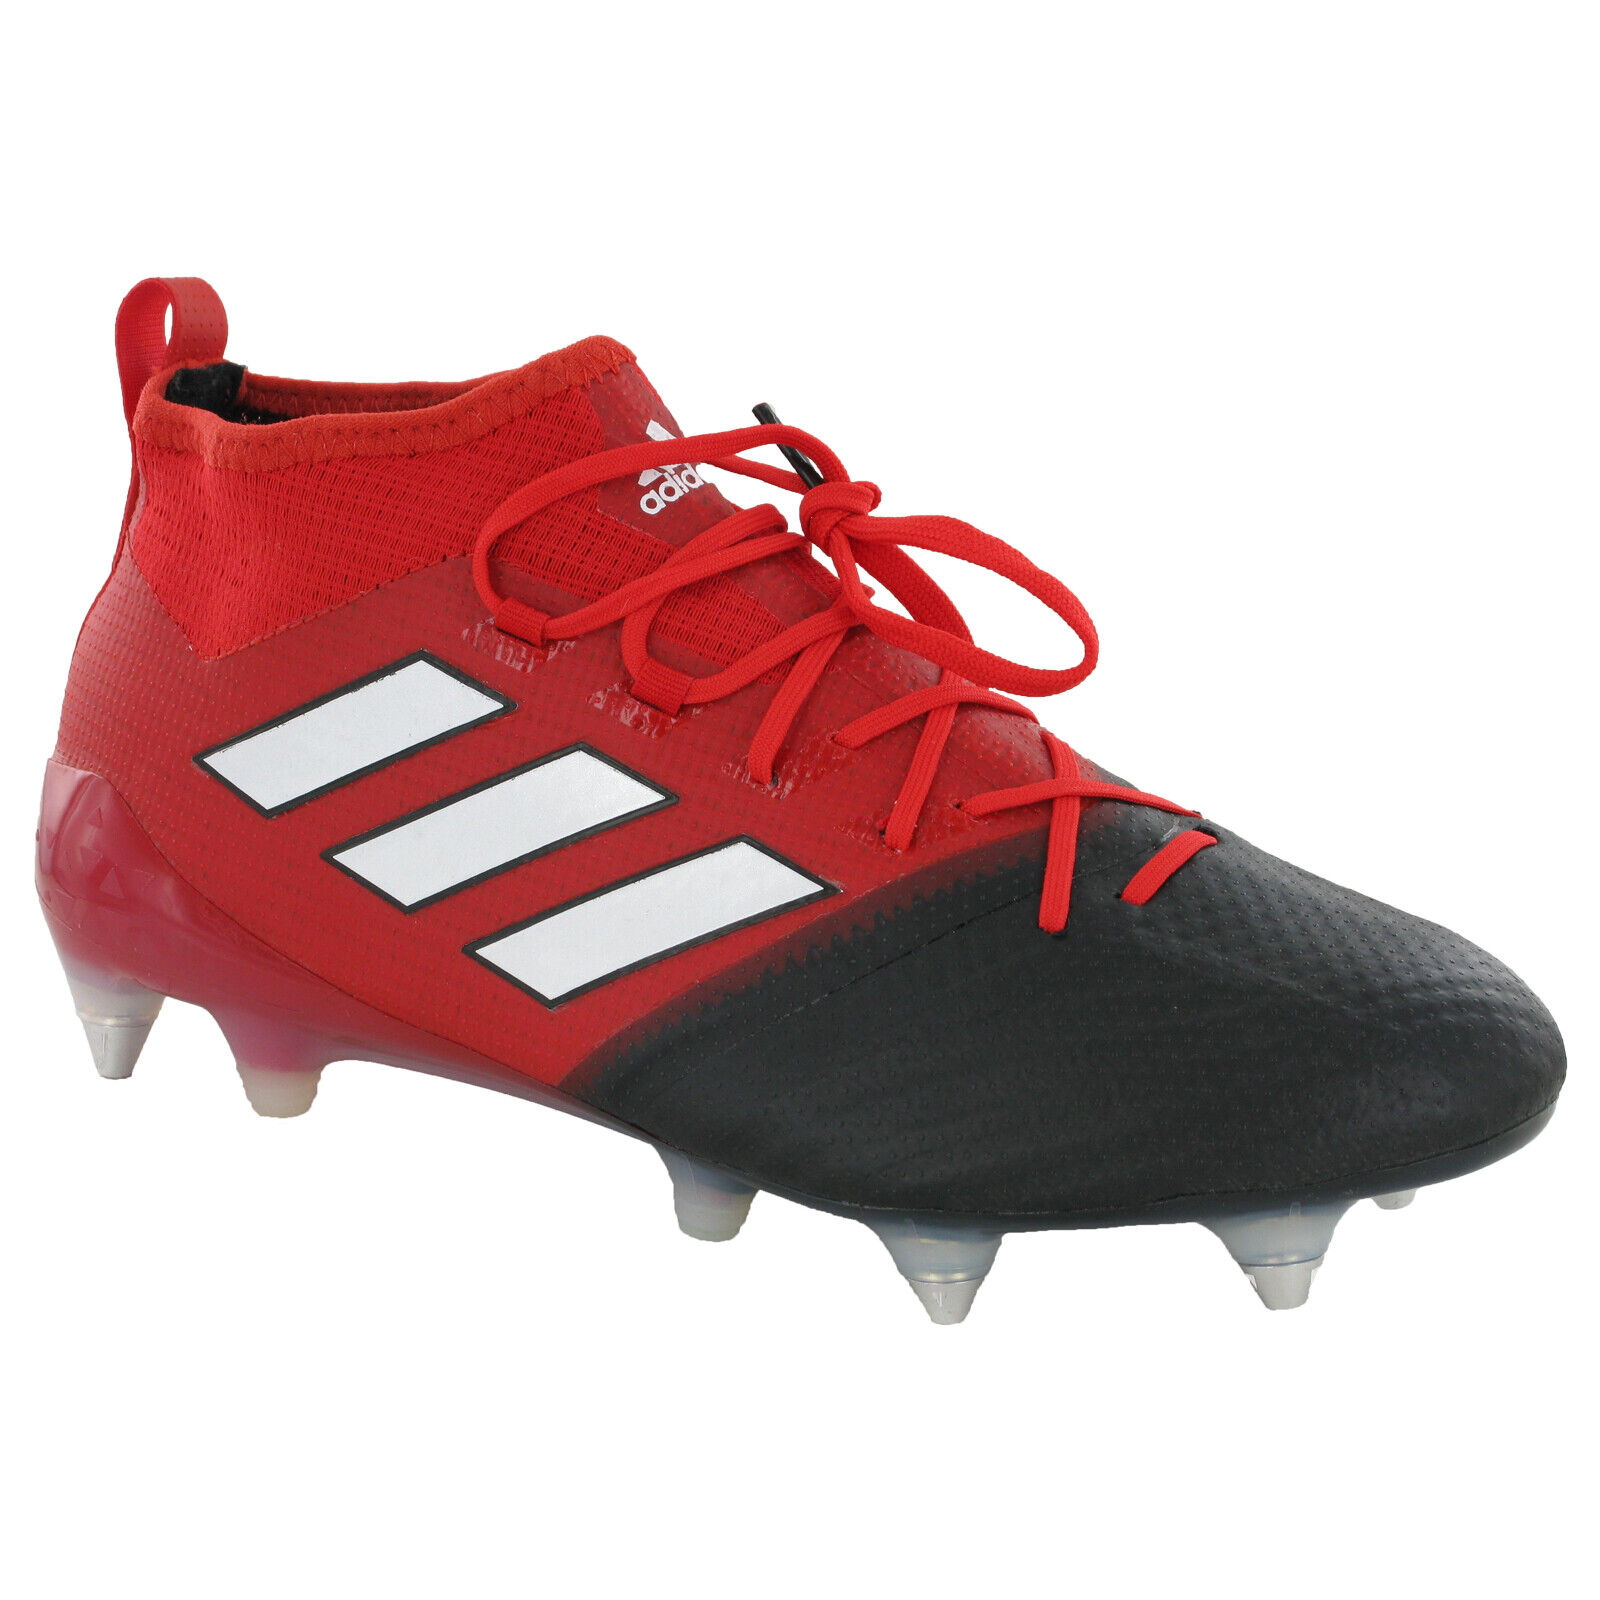 Adidas ace 17.1 primeknit sg football bottes studded Hommes cleats ba9188